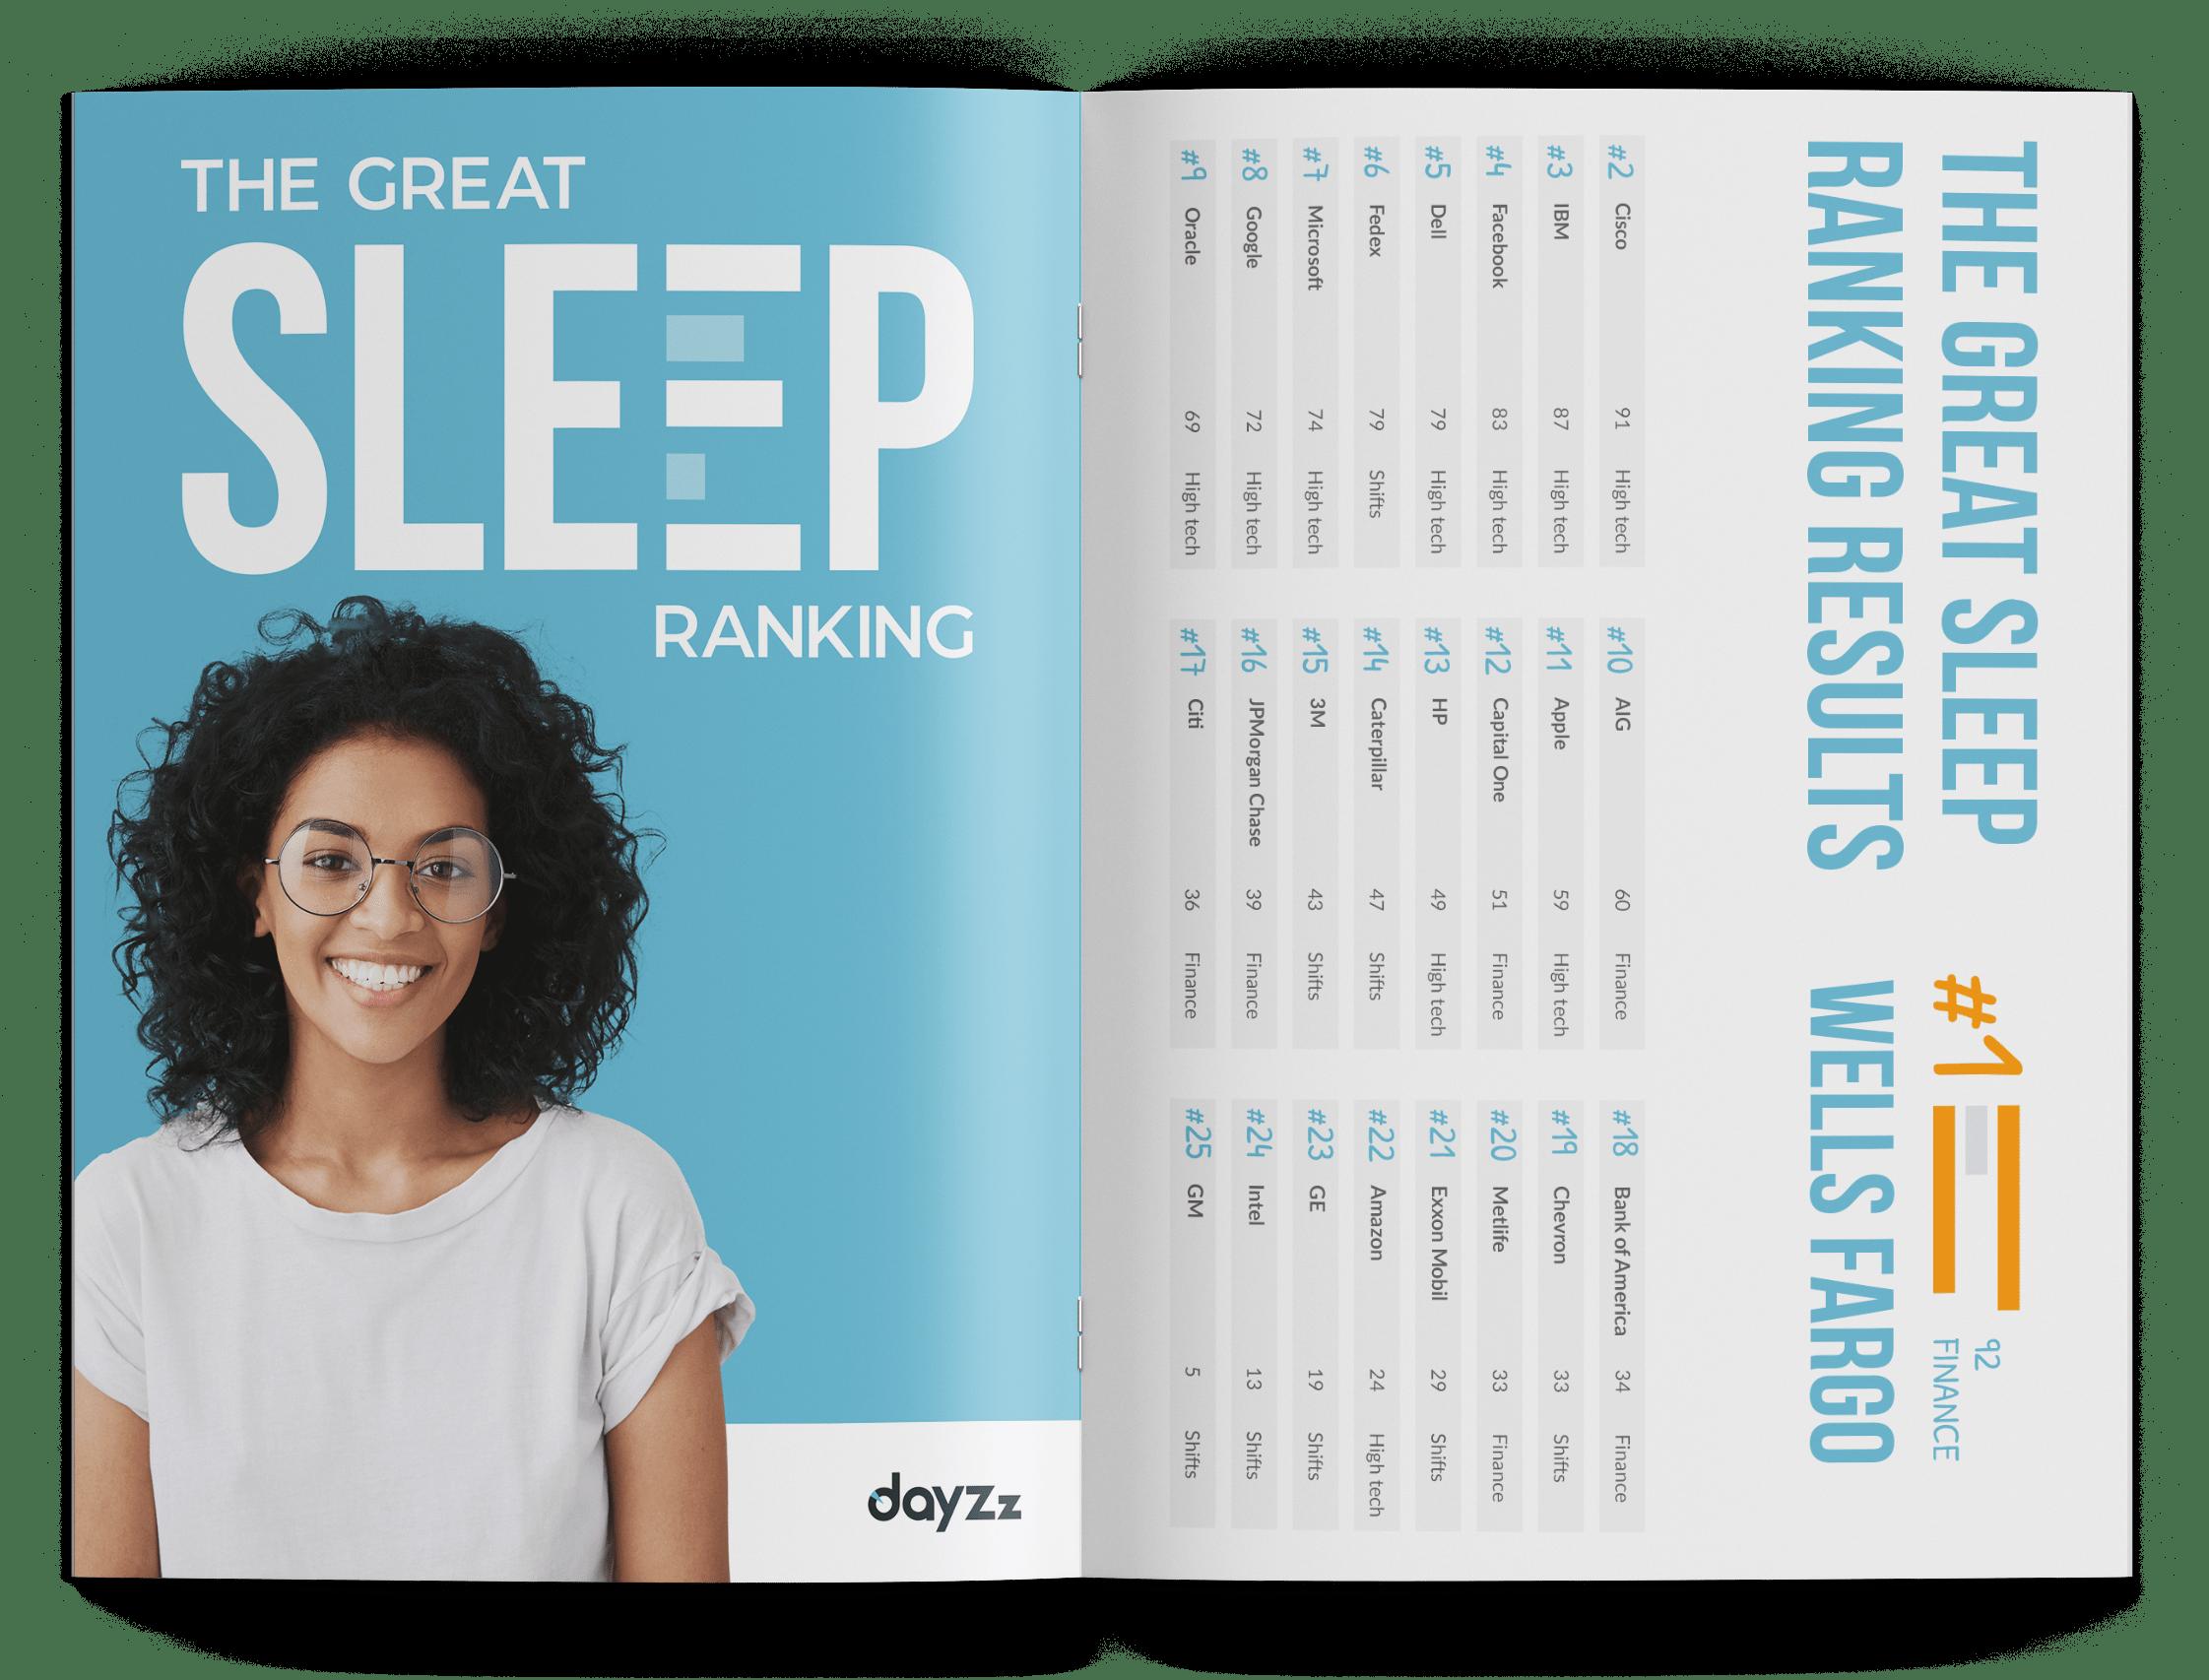 The Great Sleep Ranking